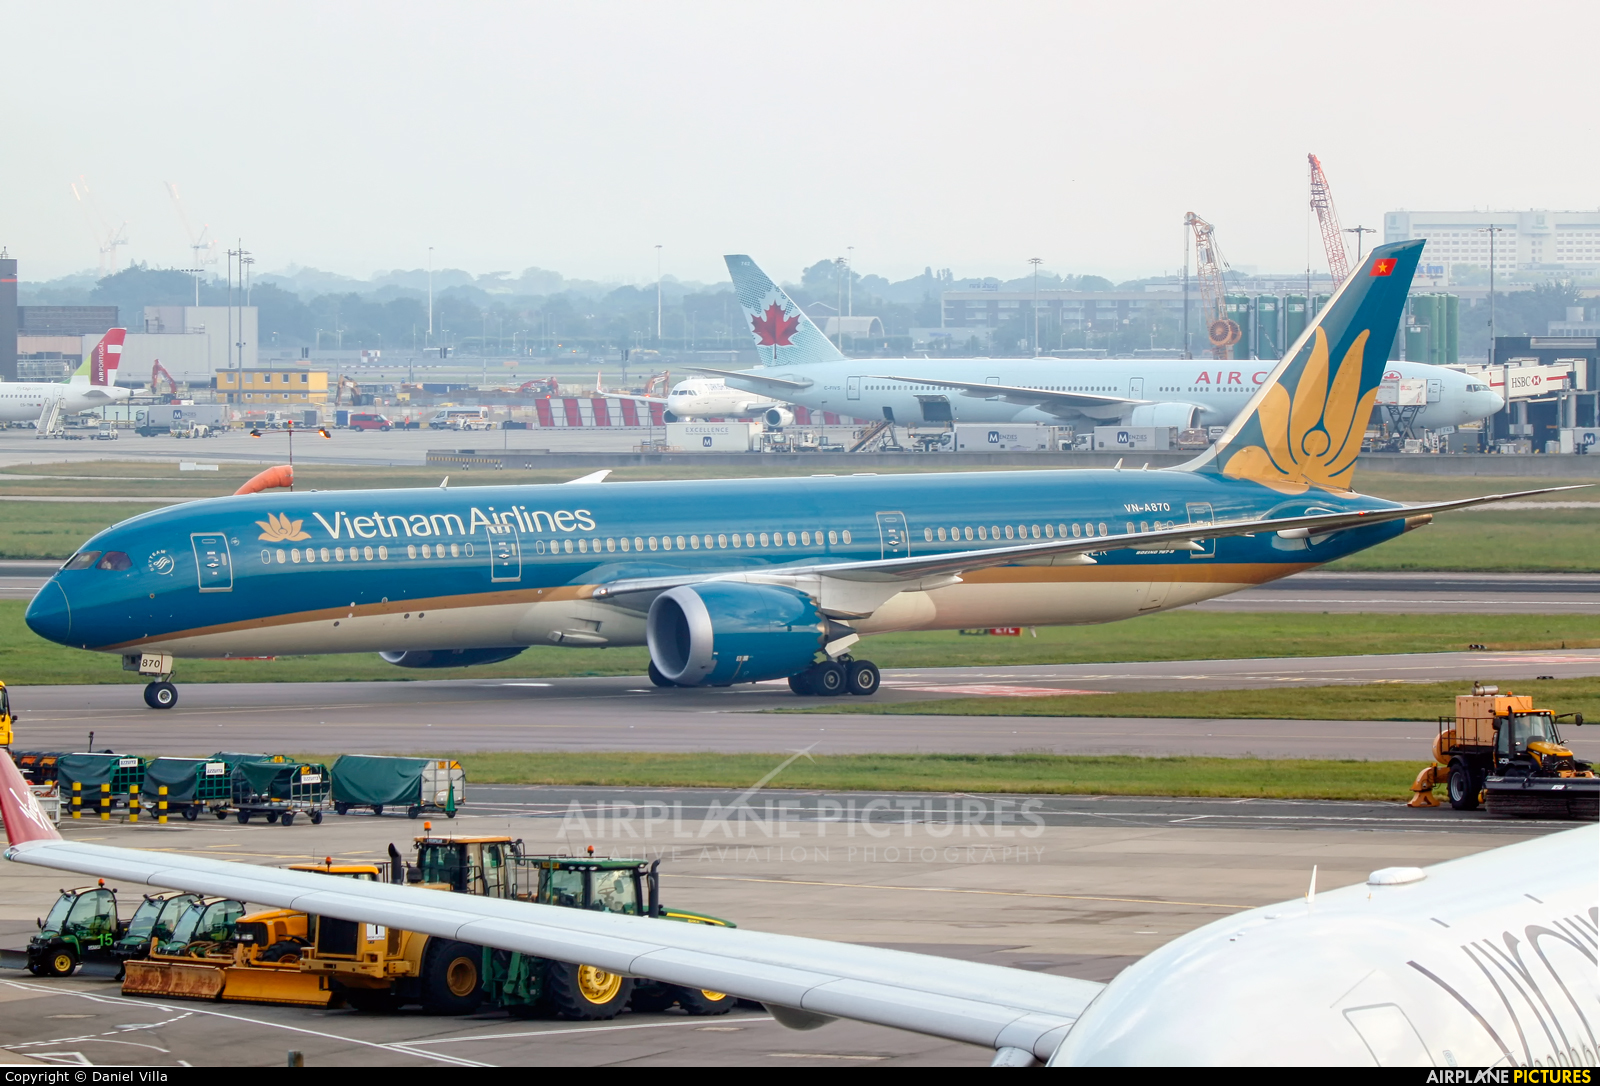 Vietnam Airlines VN-A870 aircraft at London - Heathrow